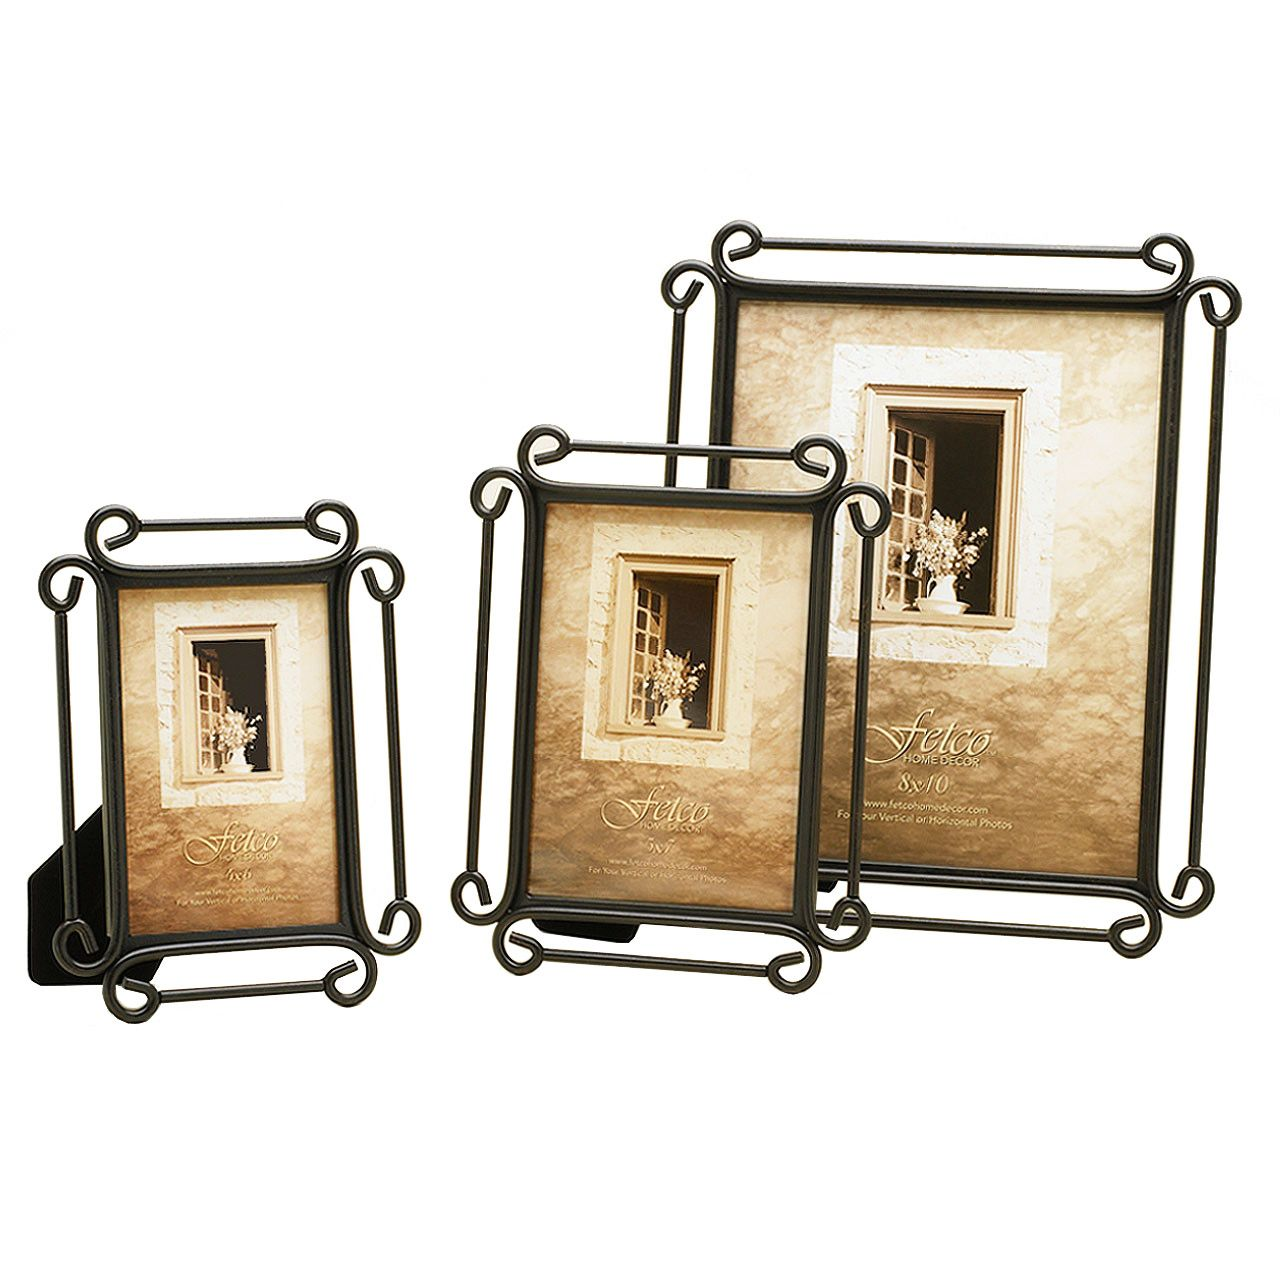 fetco home decor long wood triple frame rustic black | Villa ...